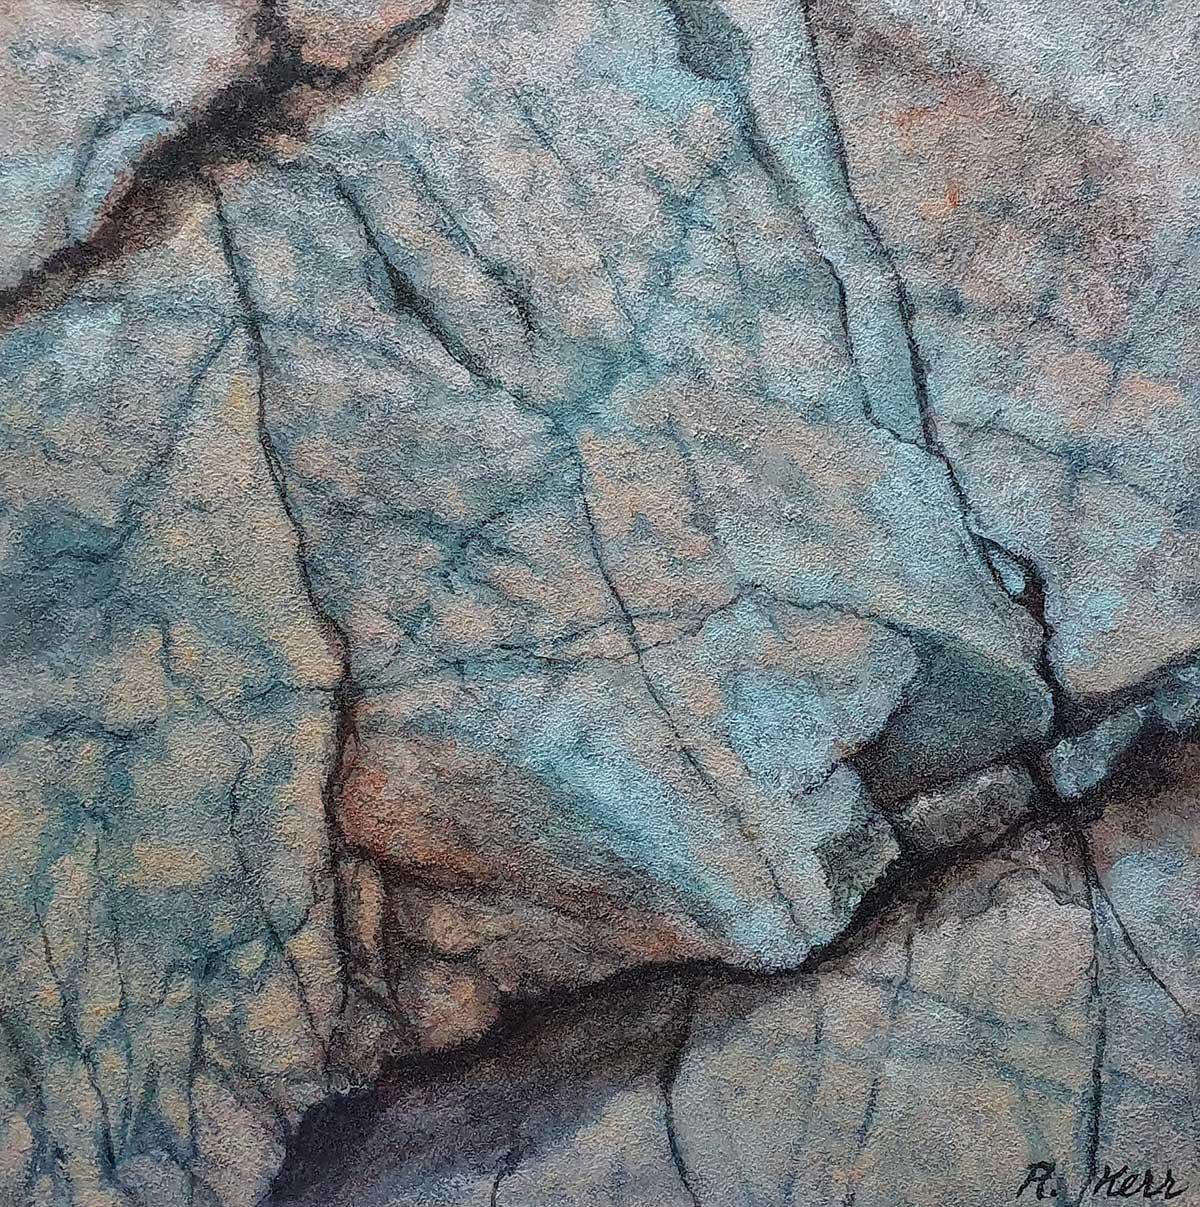 'Blue Black',mixed media on paper, 59cm x 70cm framed